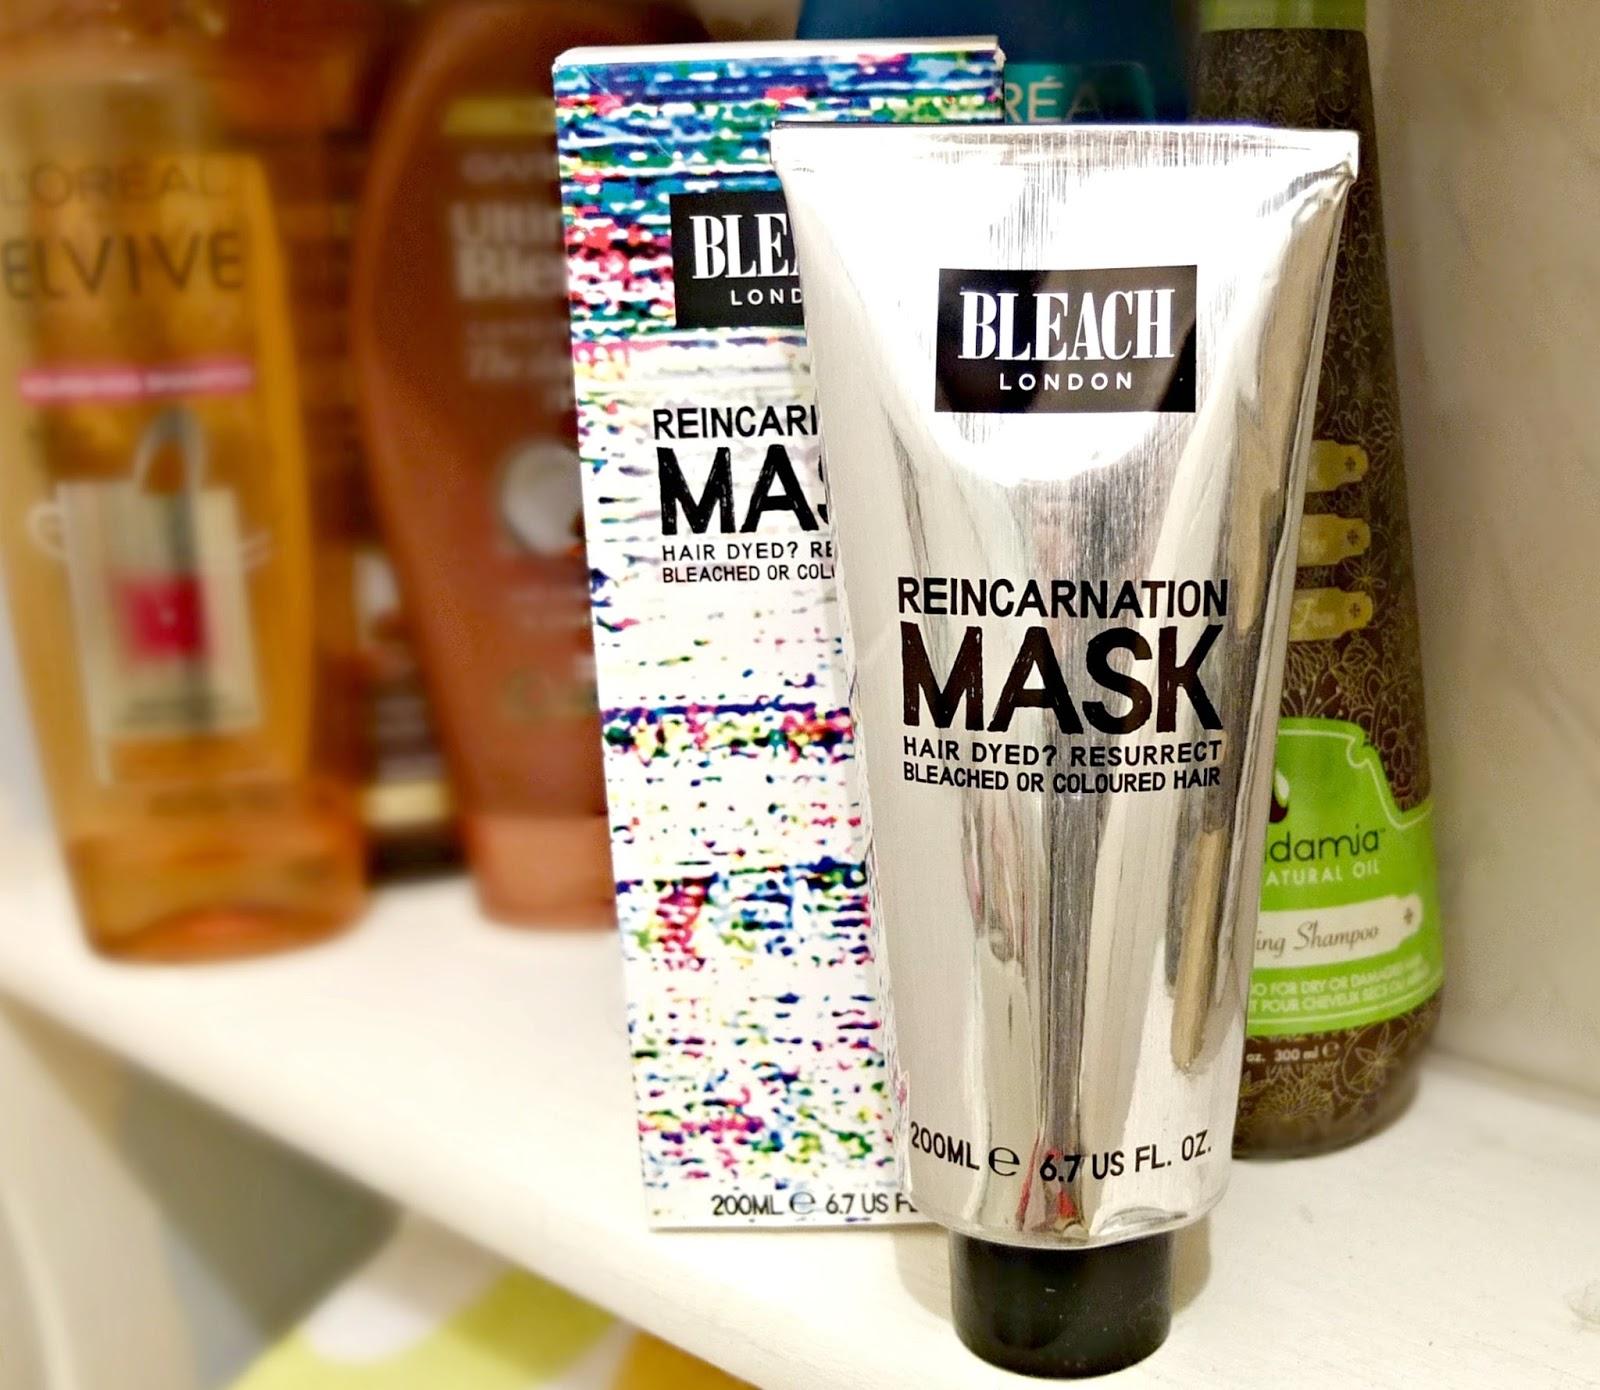 bleach london reincarnation mask review